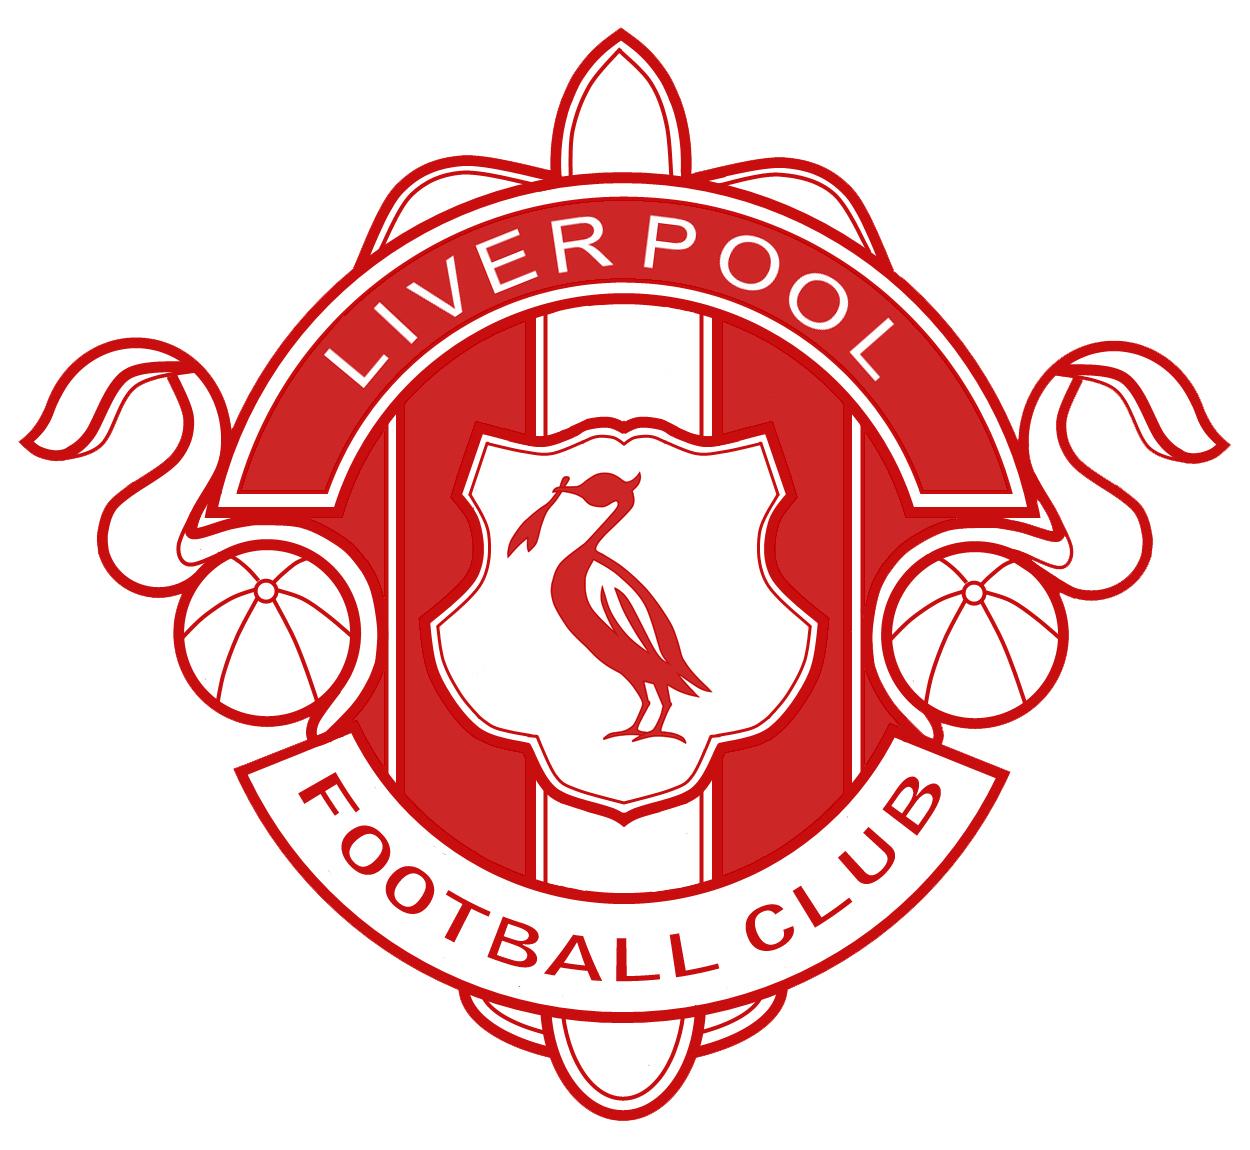 liverpool crest history: Liverpool F.C Club Crest 1960's